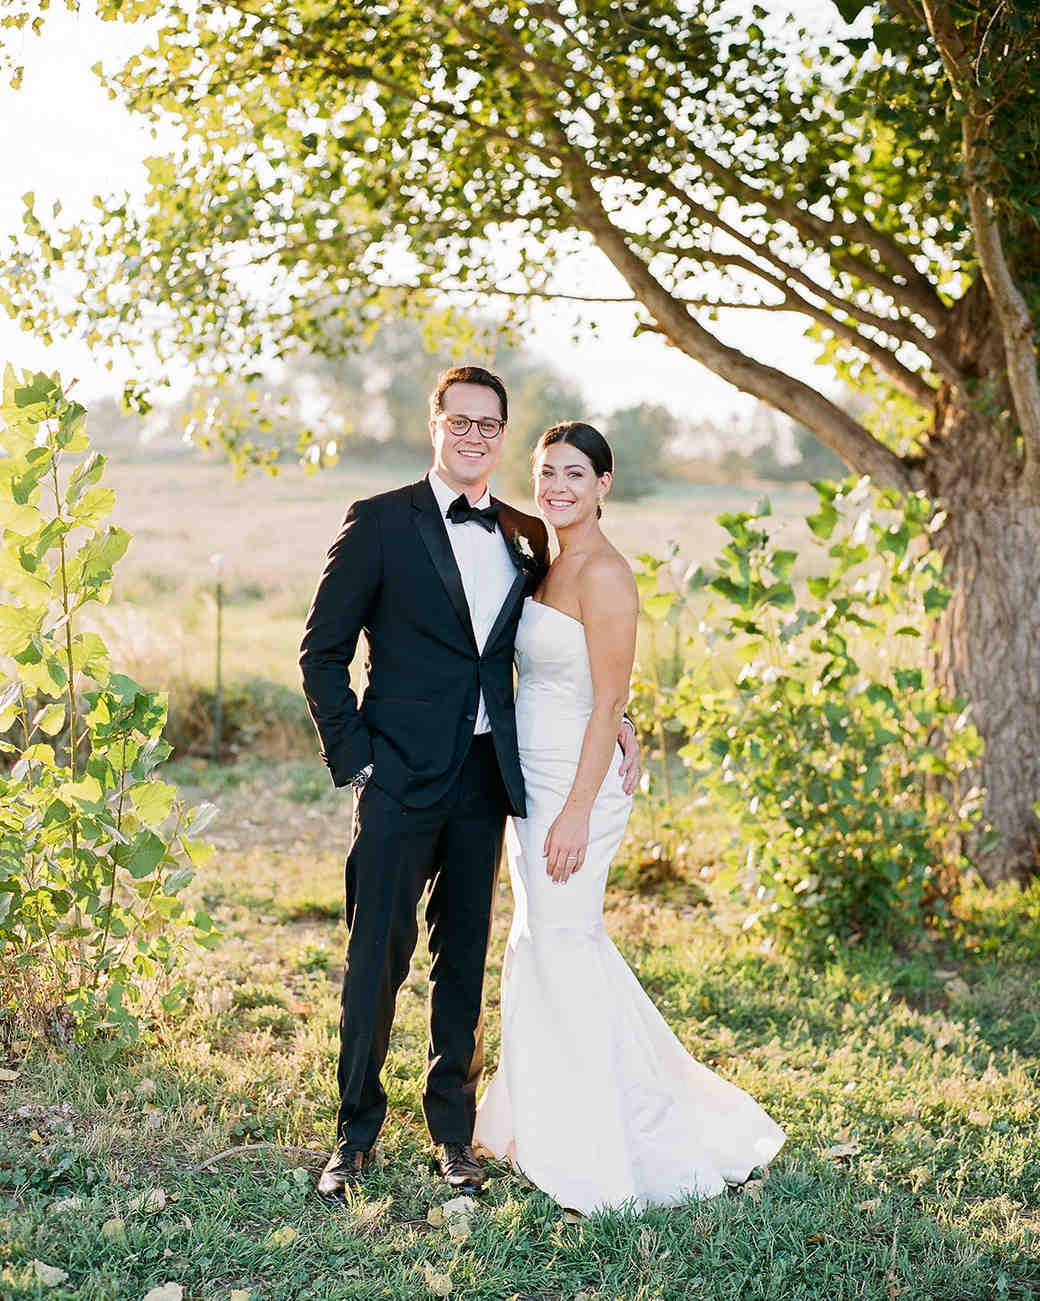 jamie jon wedding couple portrait under trees